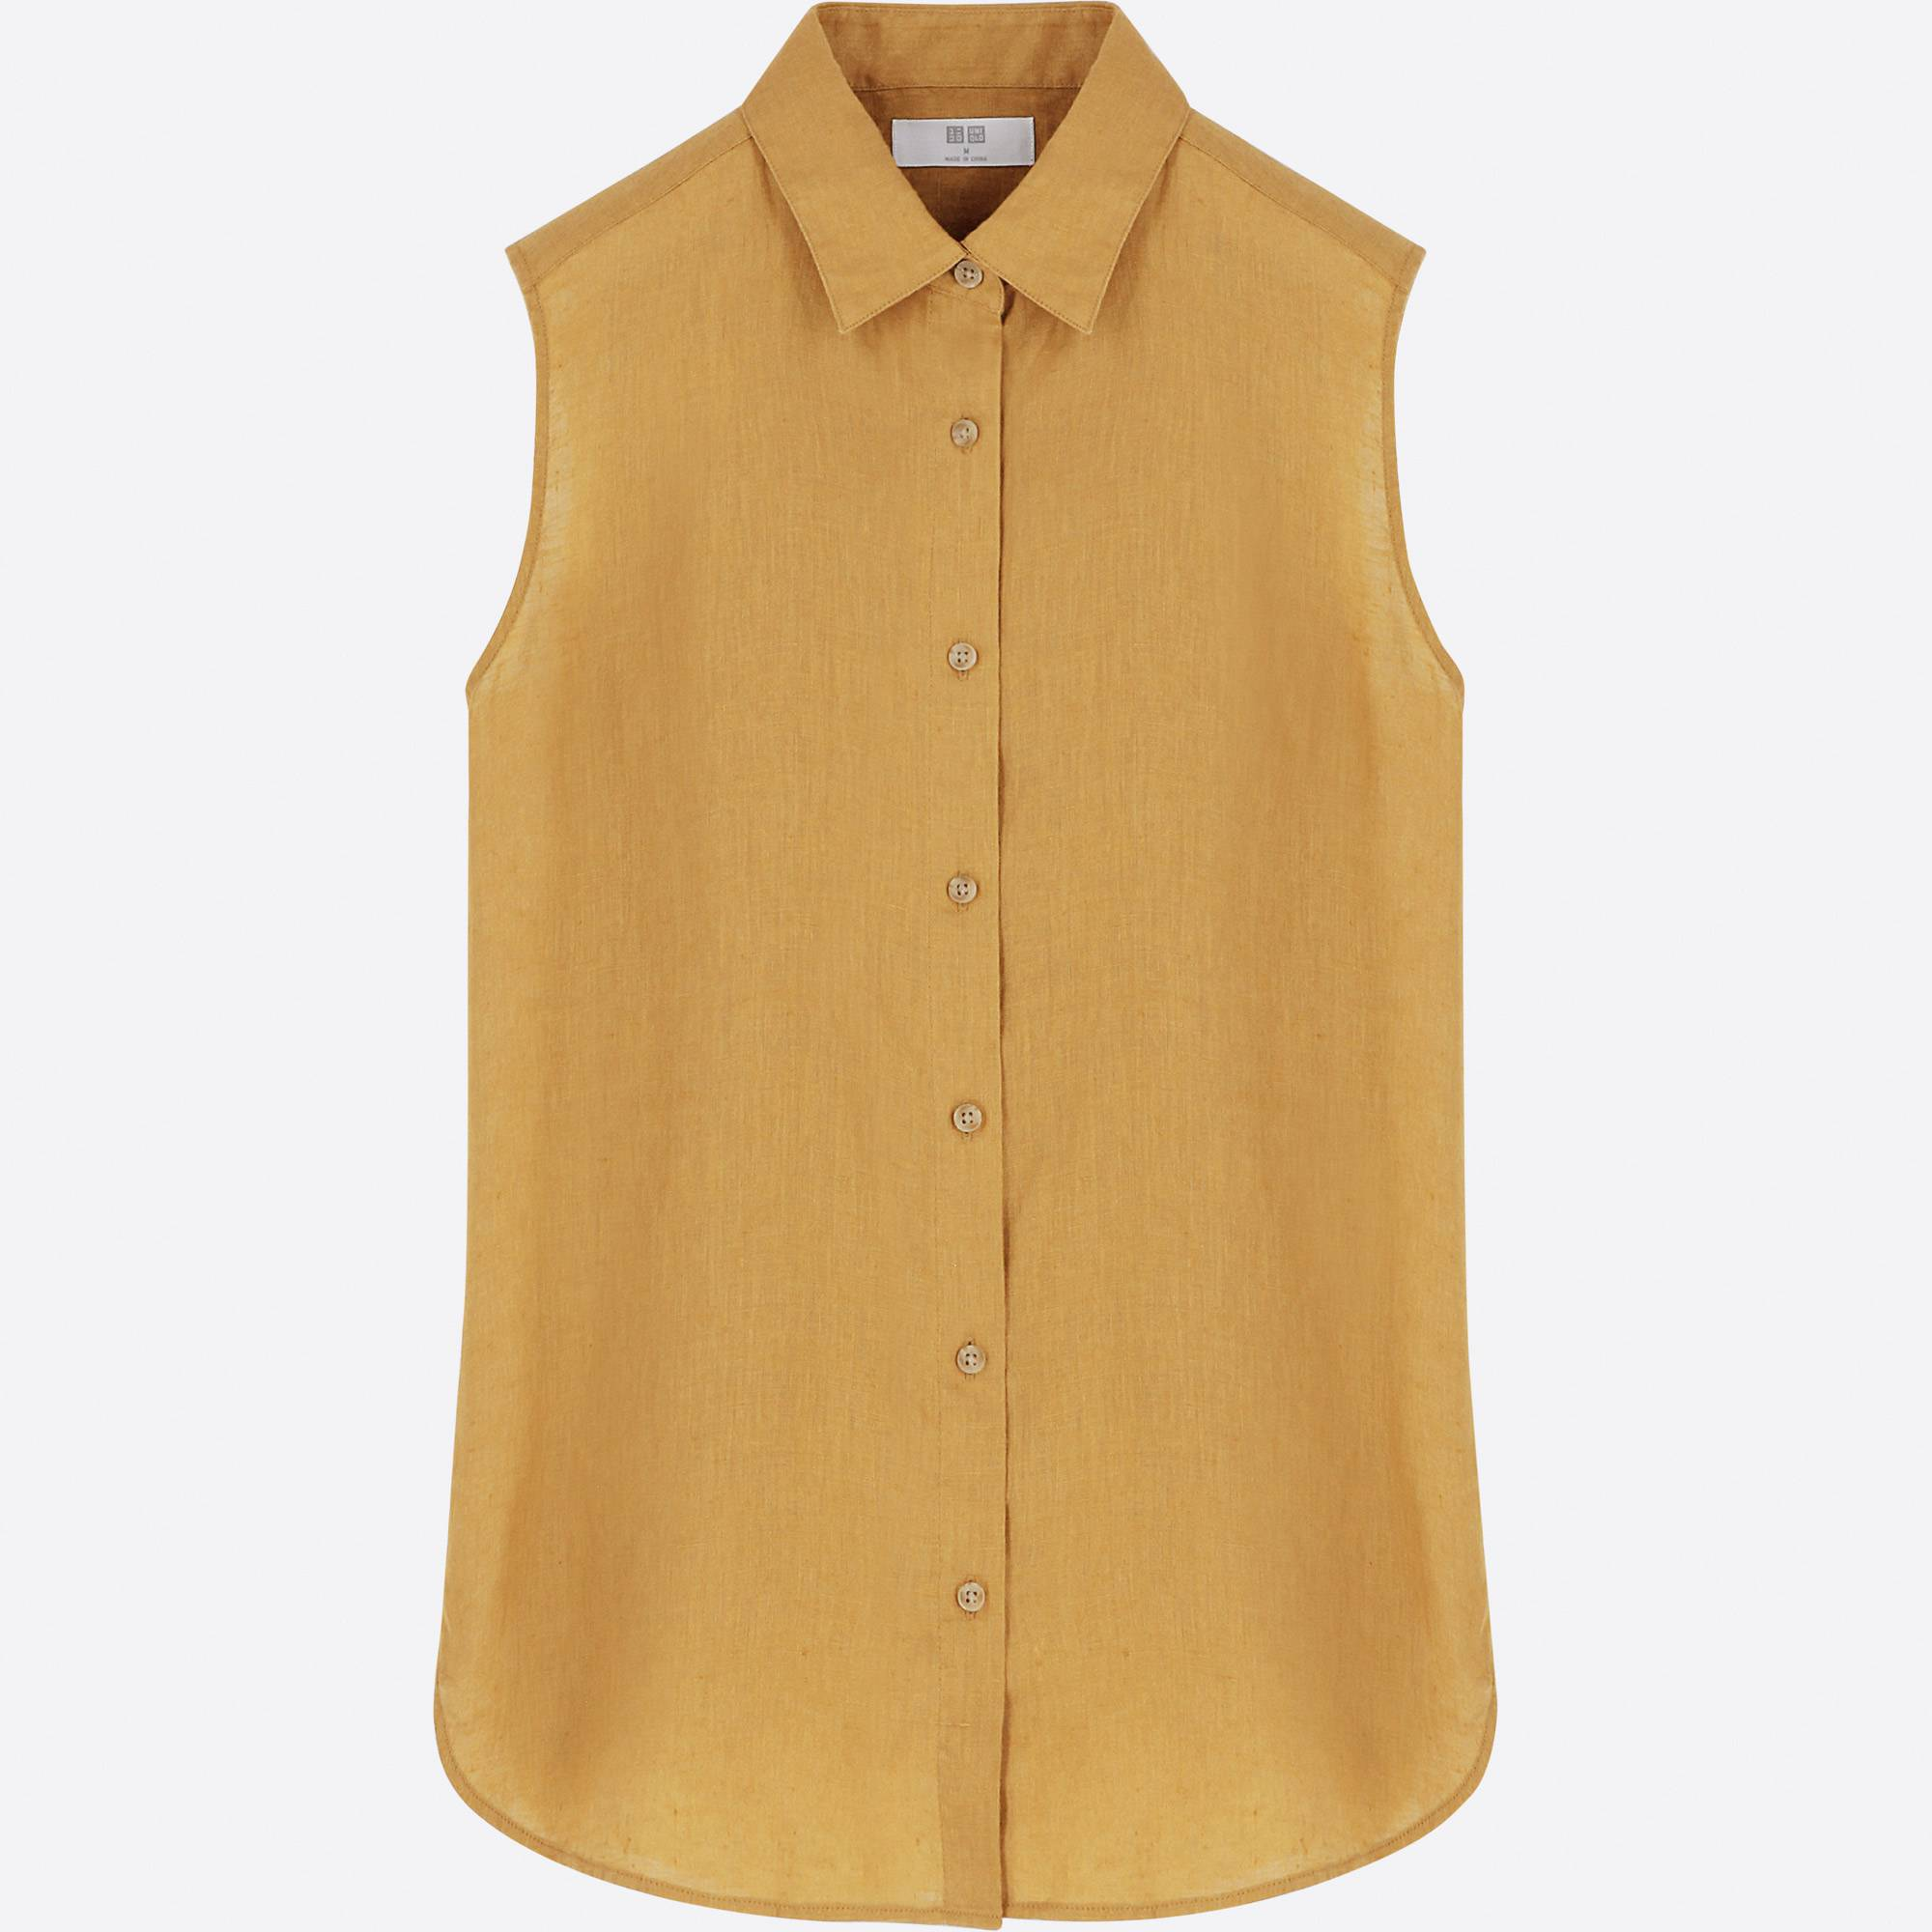 UNIQLO / Shirts And Blouses women premium linen sleeveless shirt